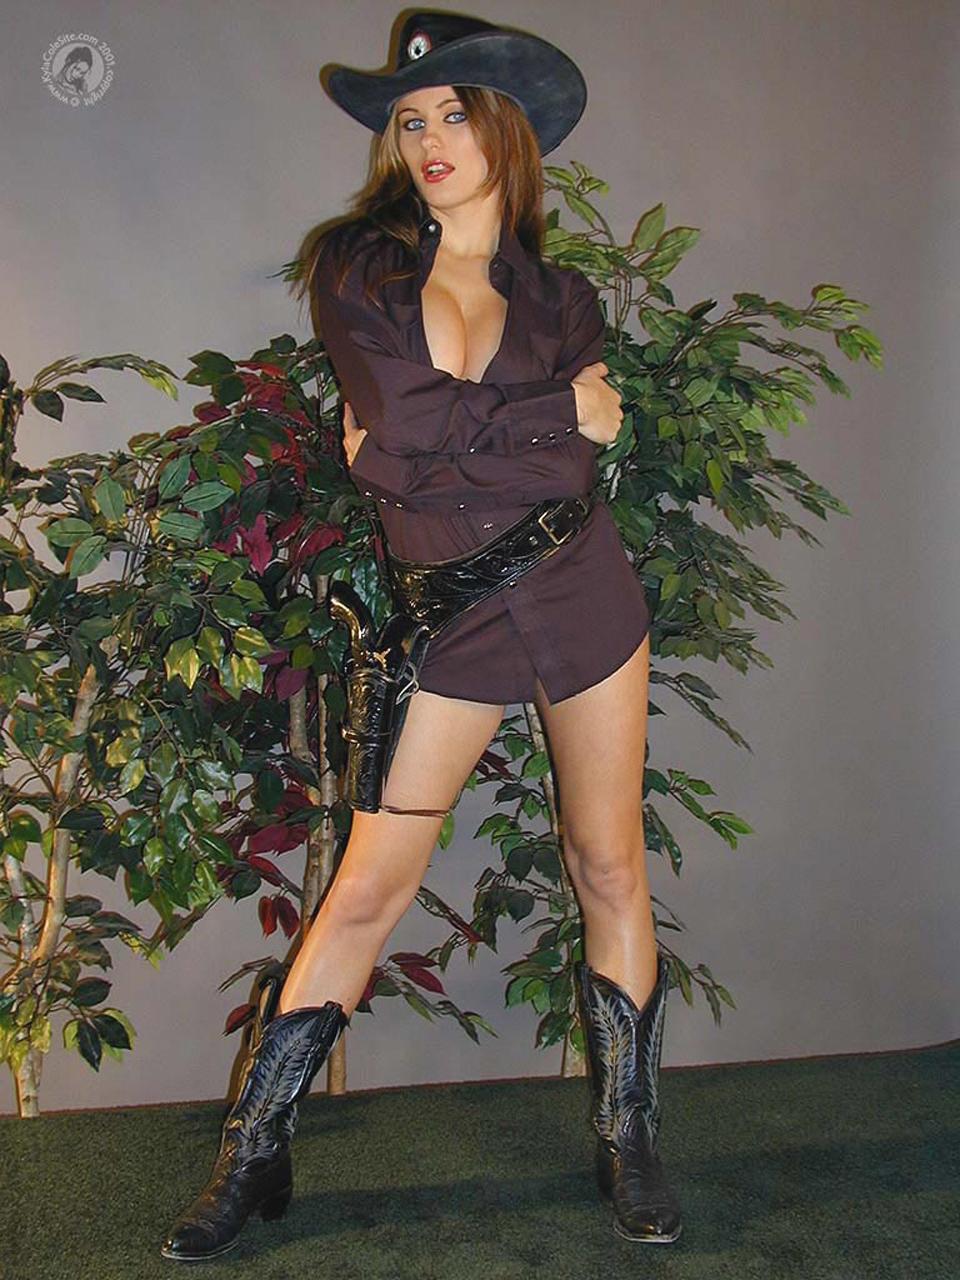 kyla-cole-cowgirl-1